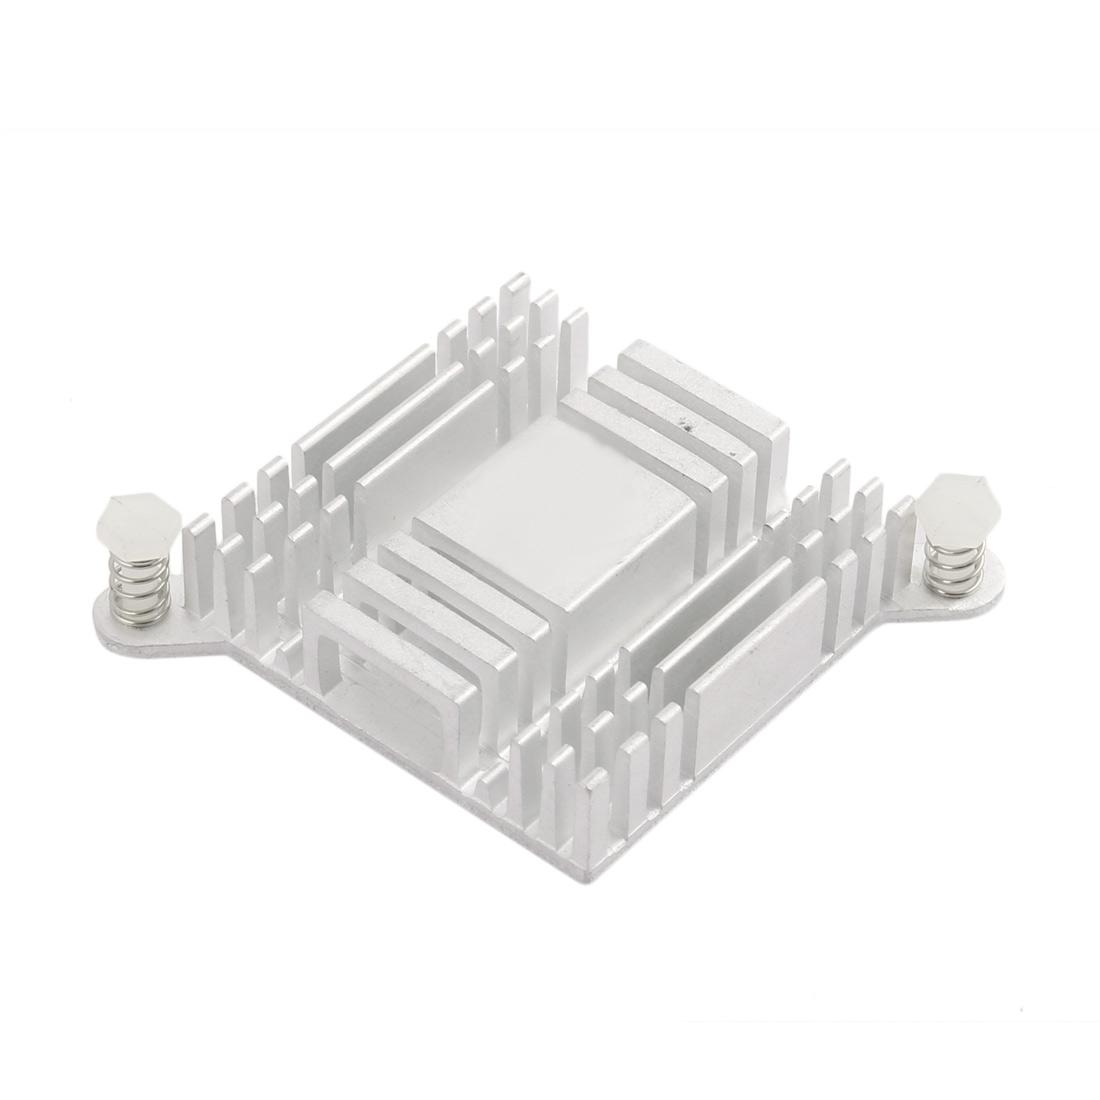 38mmx38mmx10mm White Aluminum Heatsink Heat Diffuse Cooling Fin